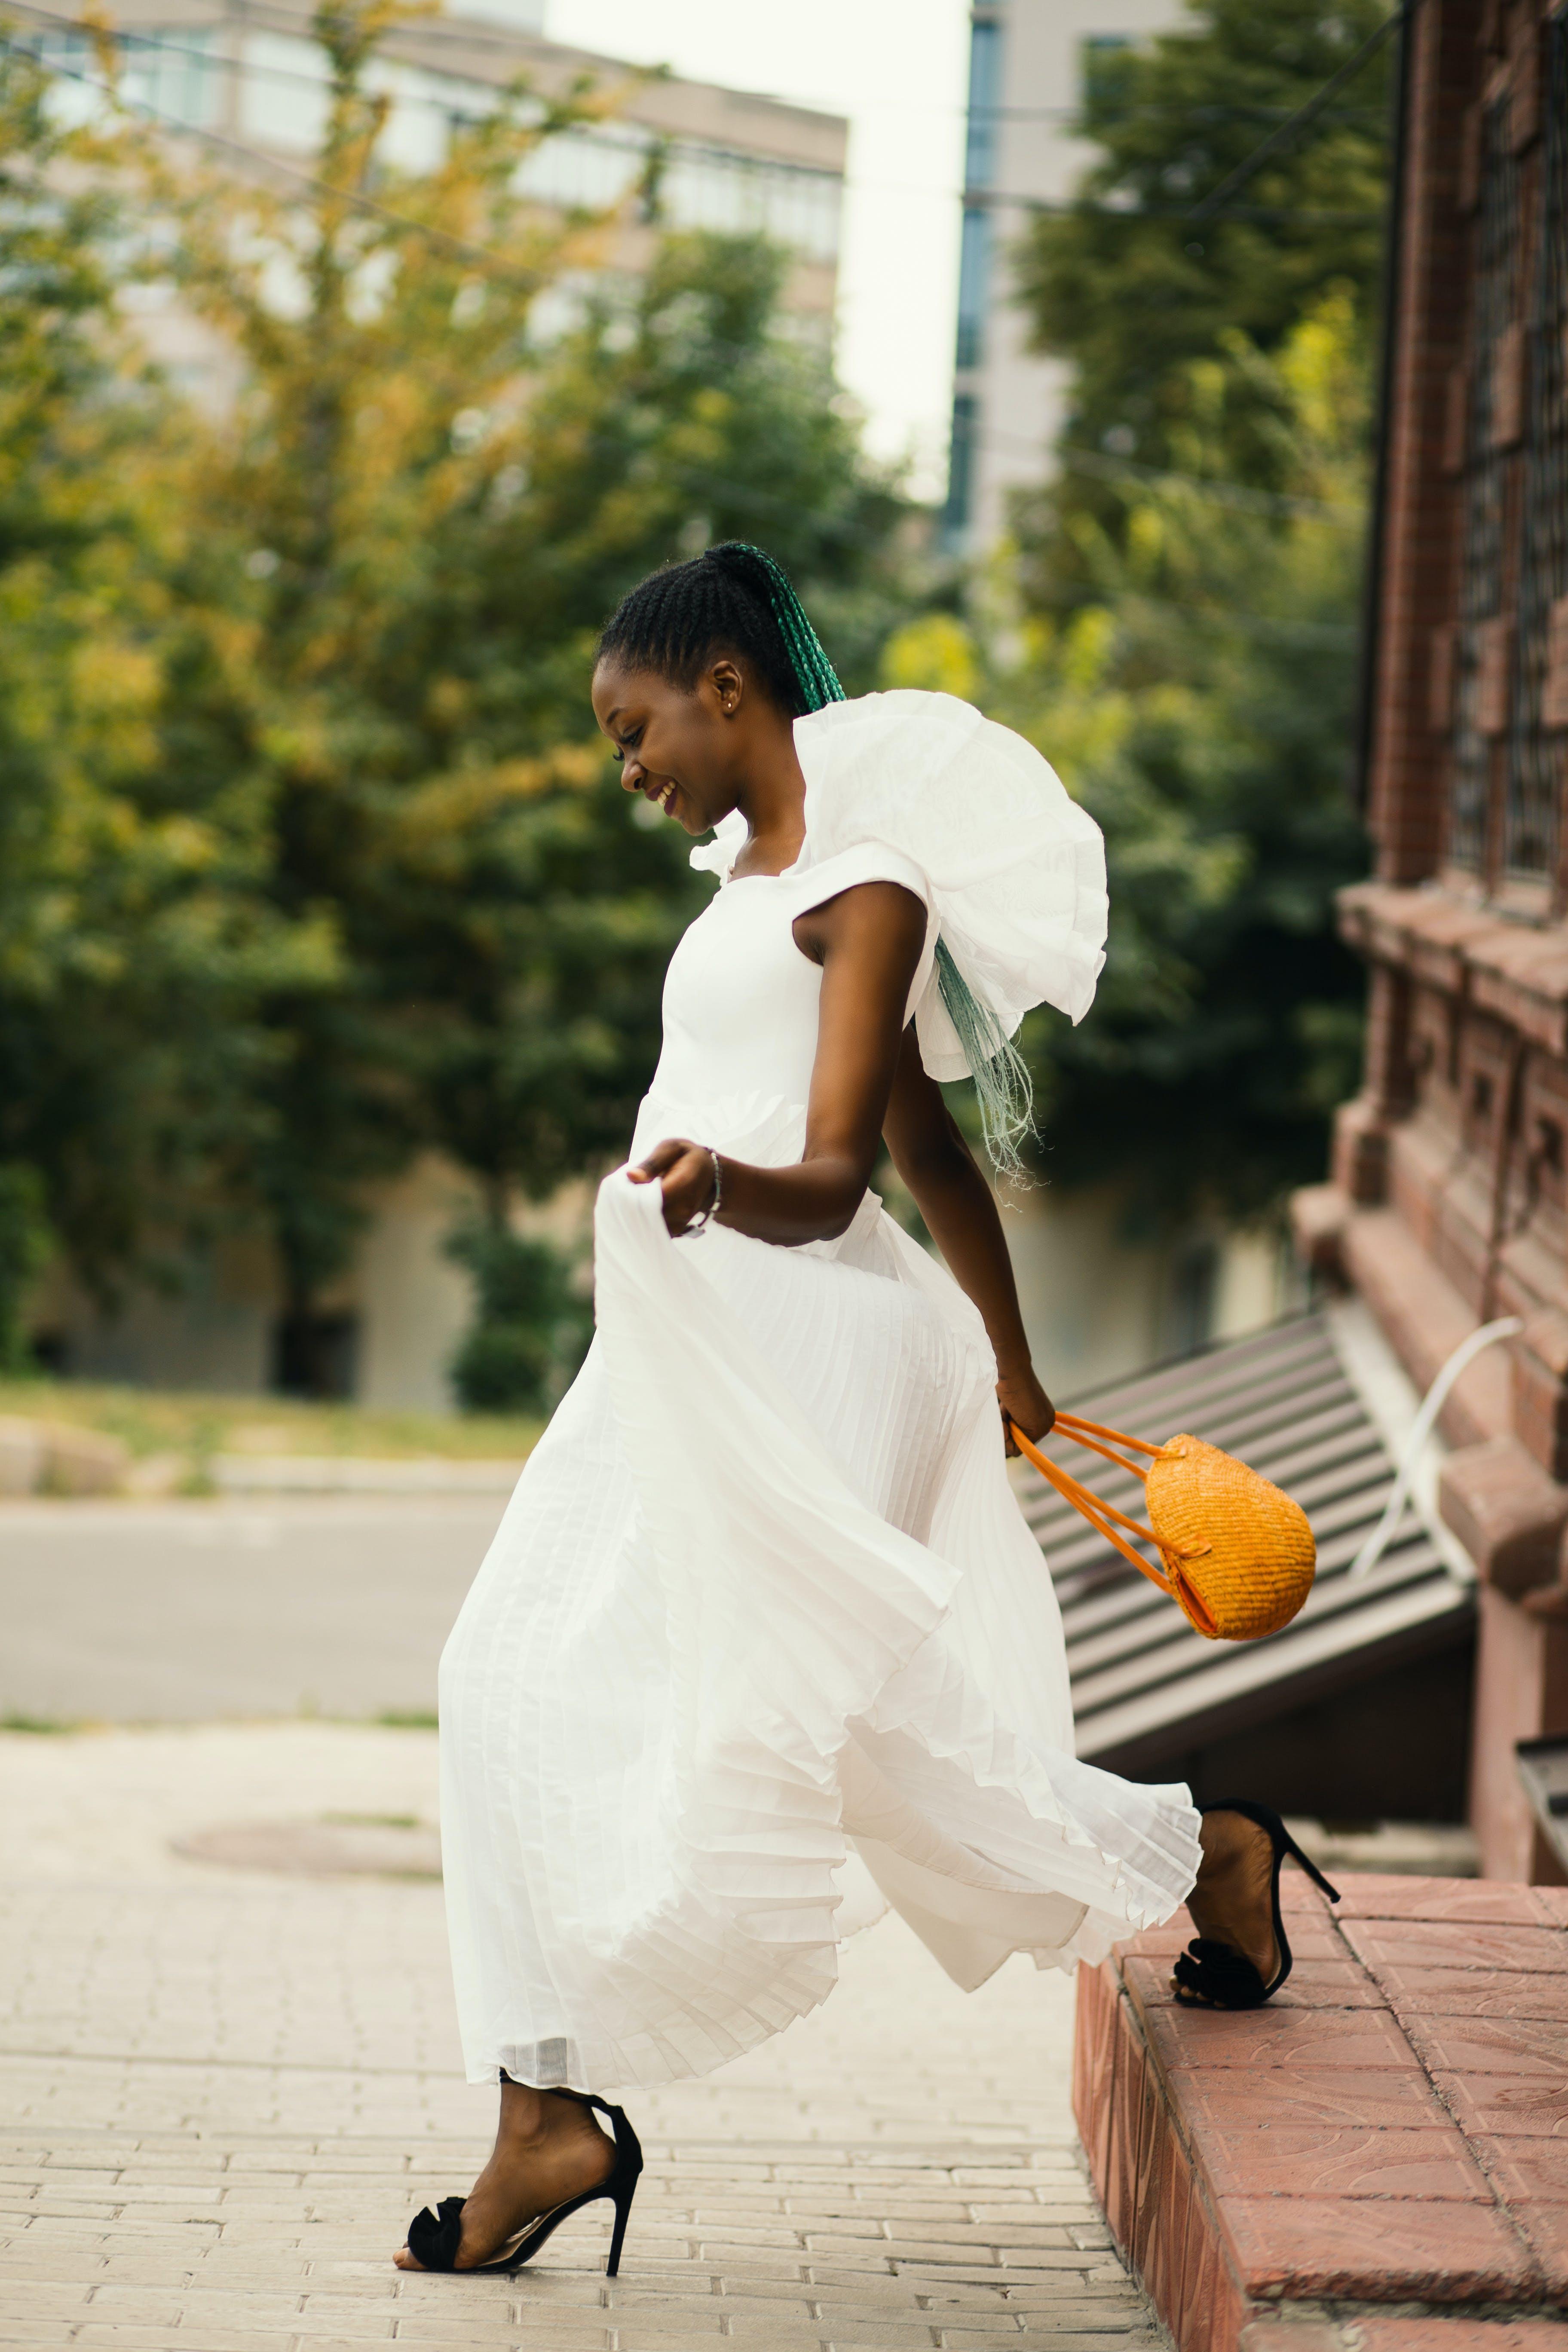 Woman Walking Wearing White Dress